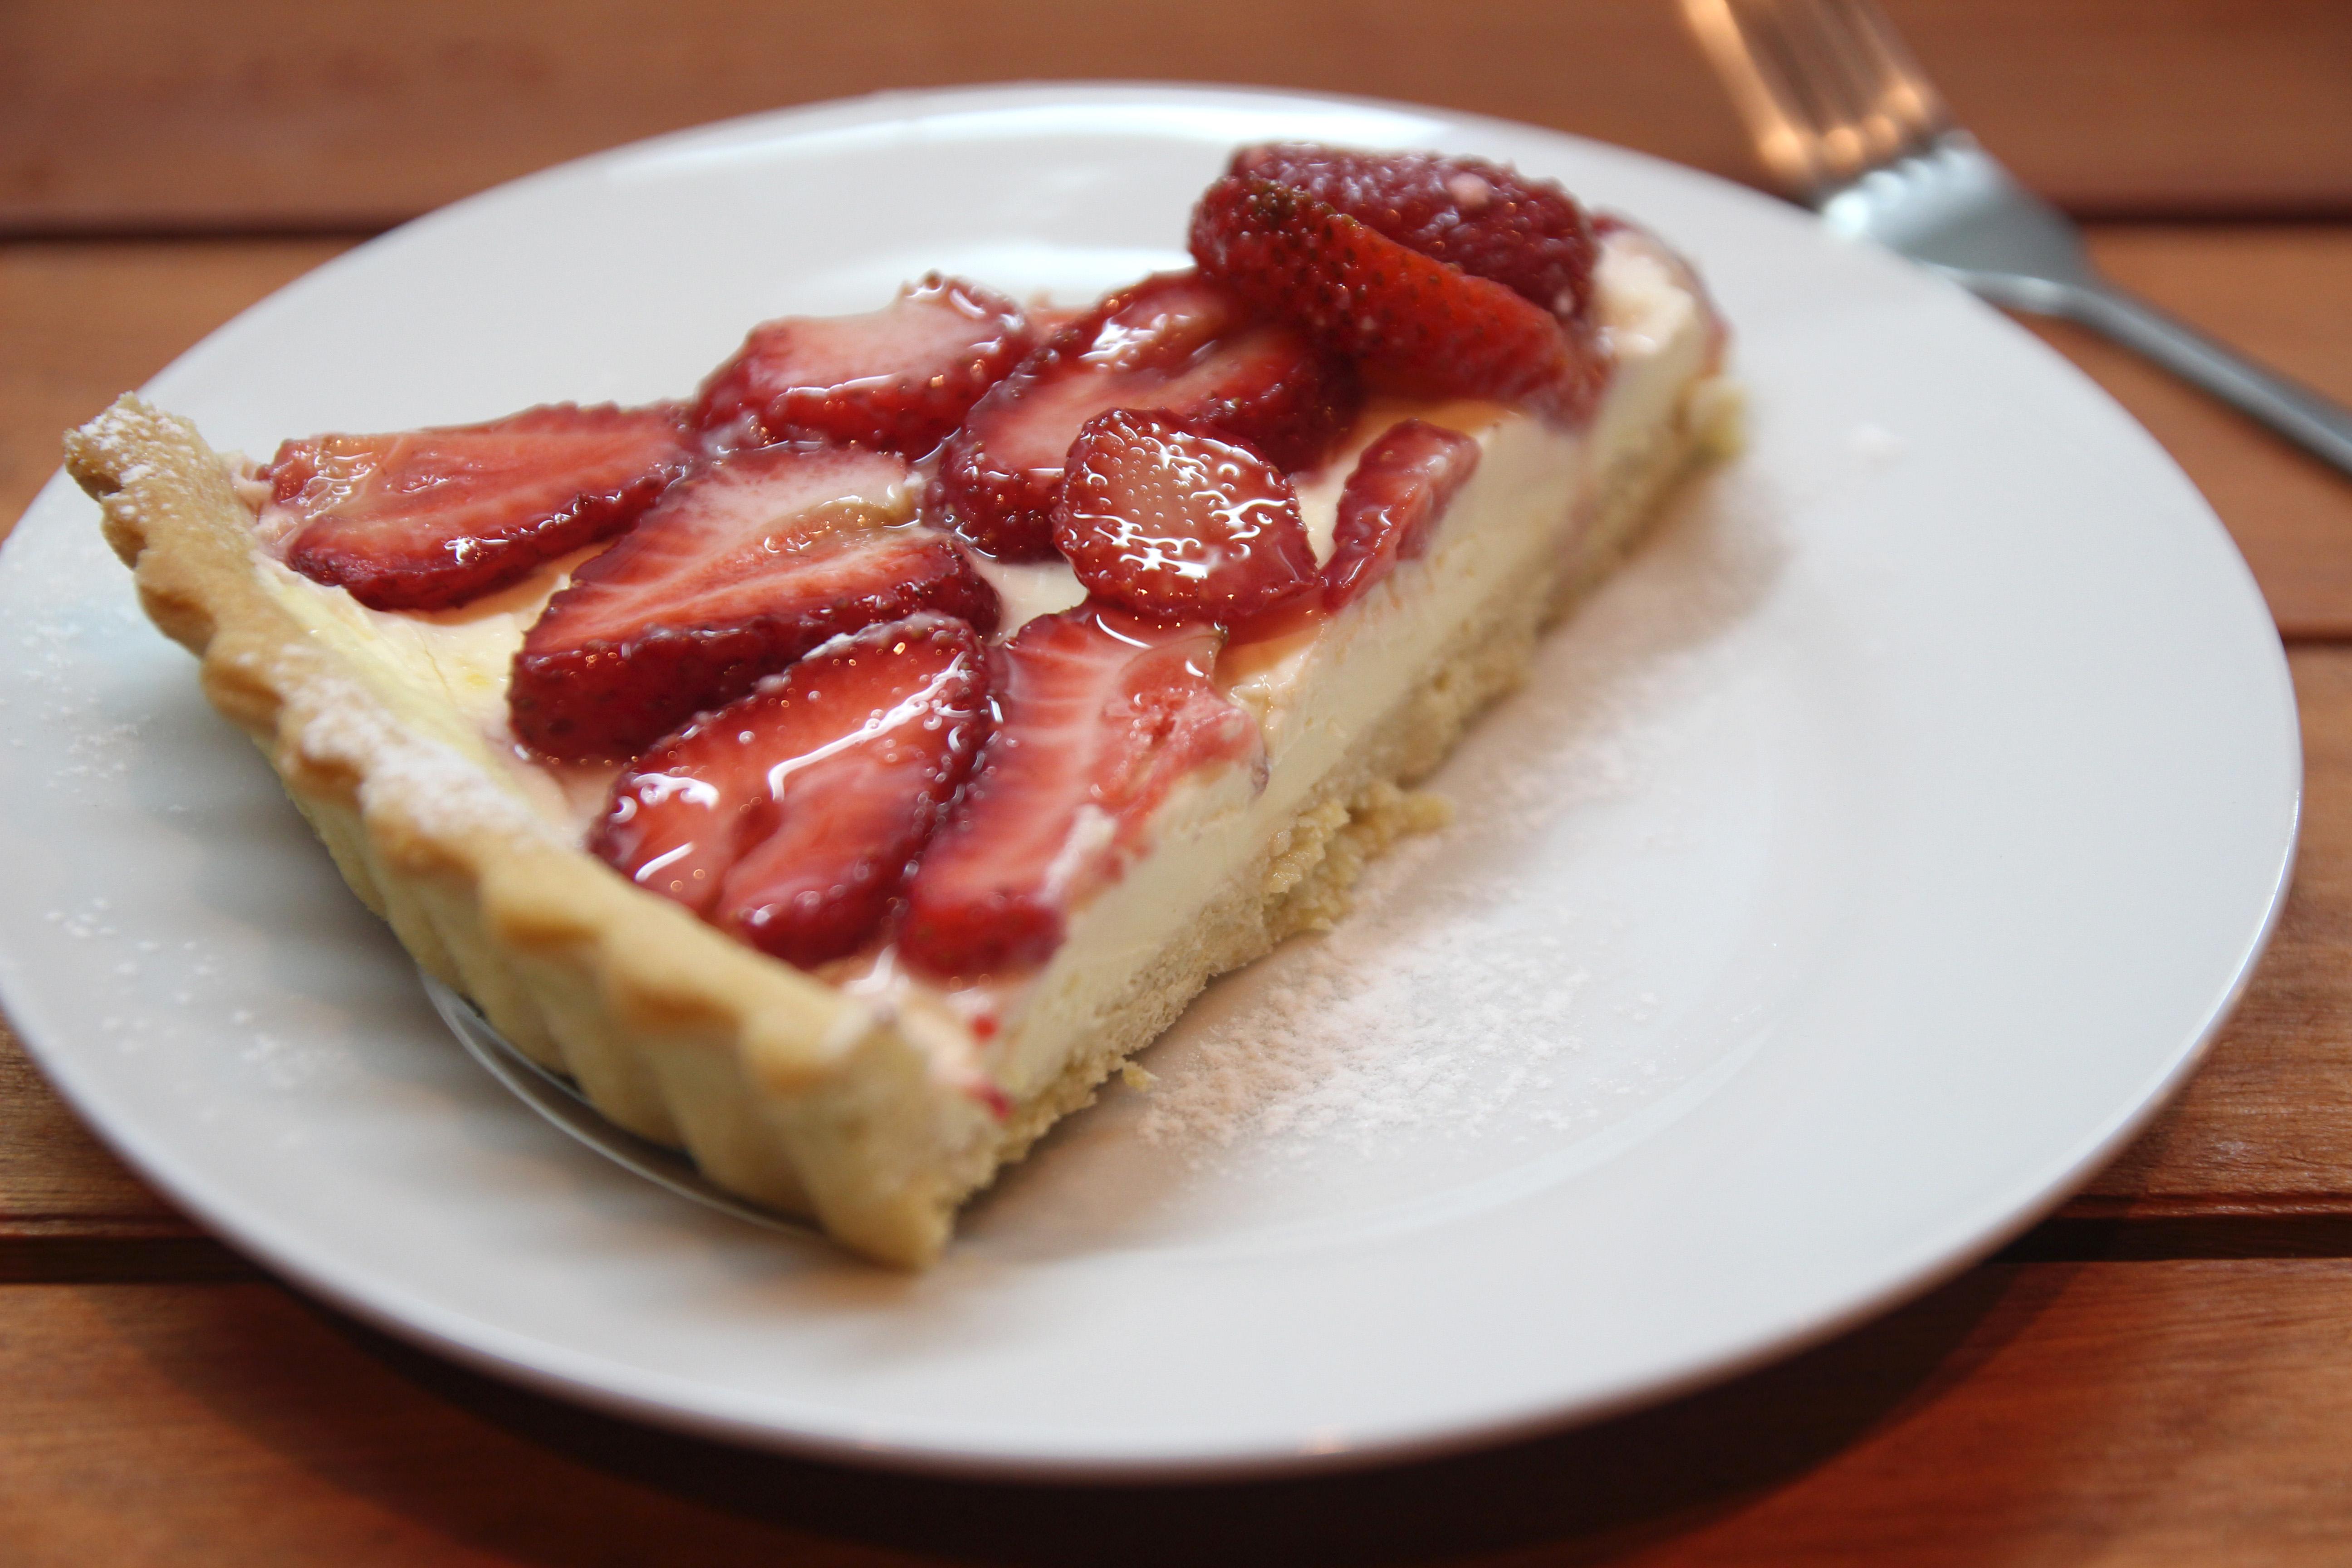 Strawberry & Lemon Mascarpone Tart